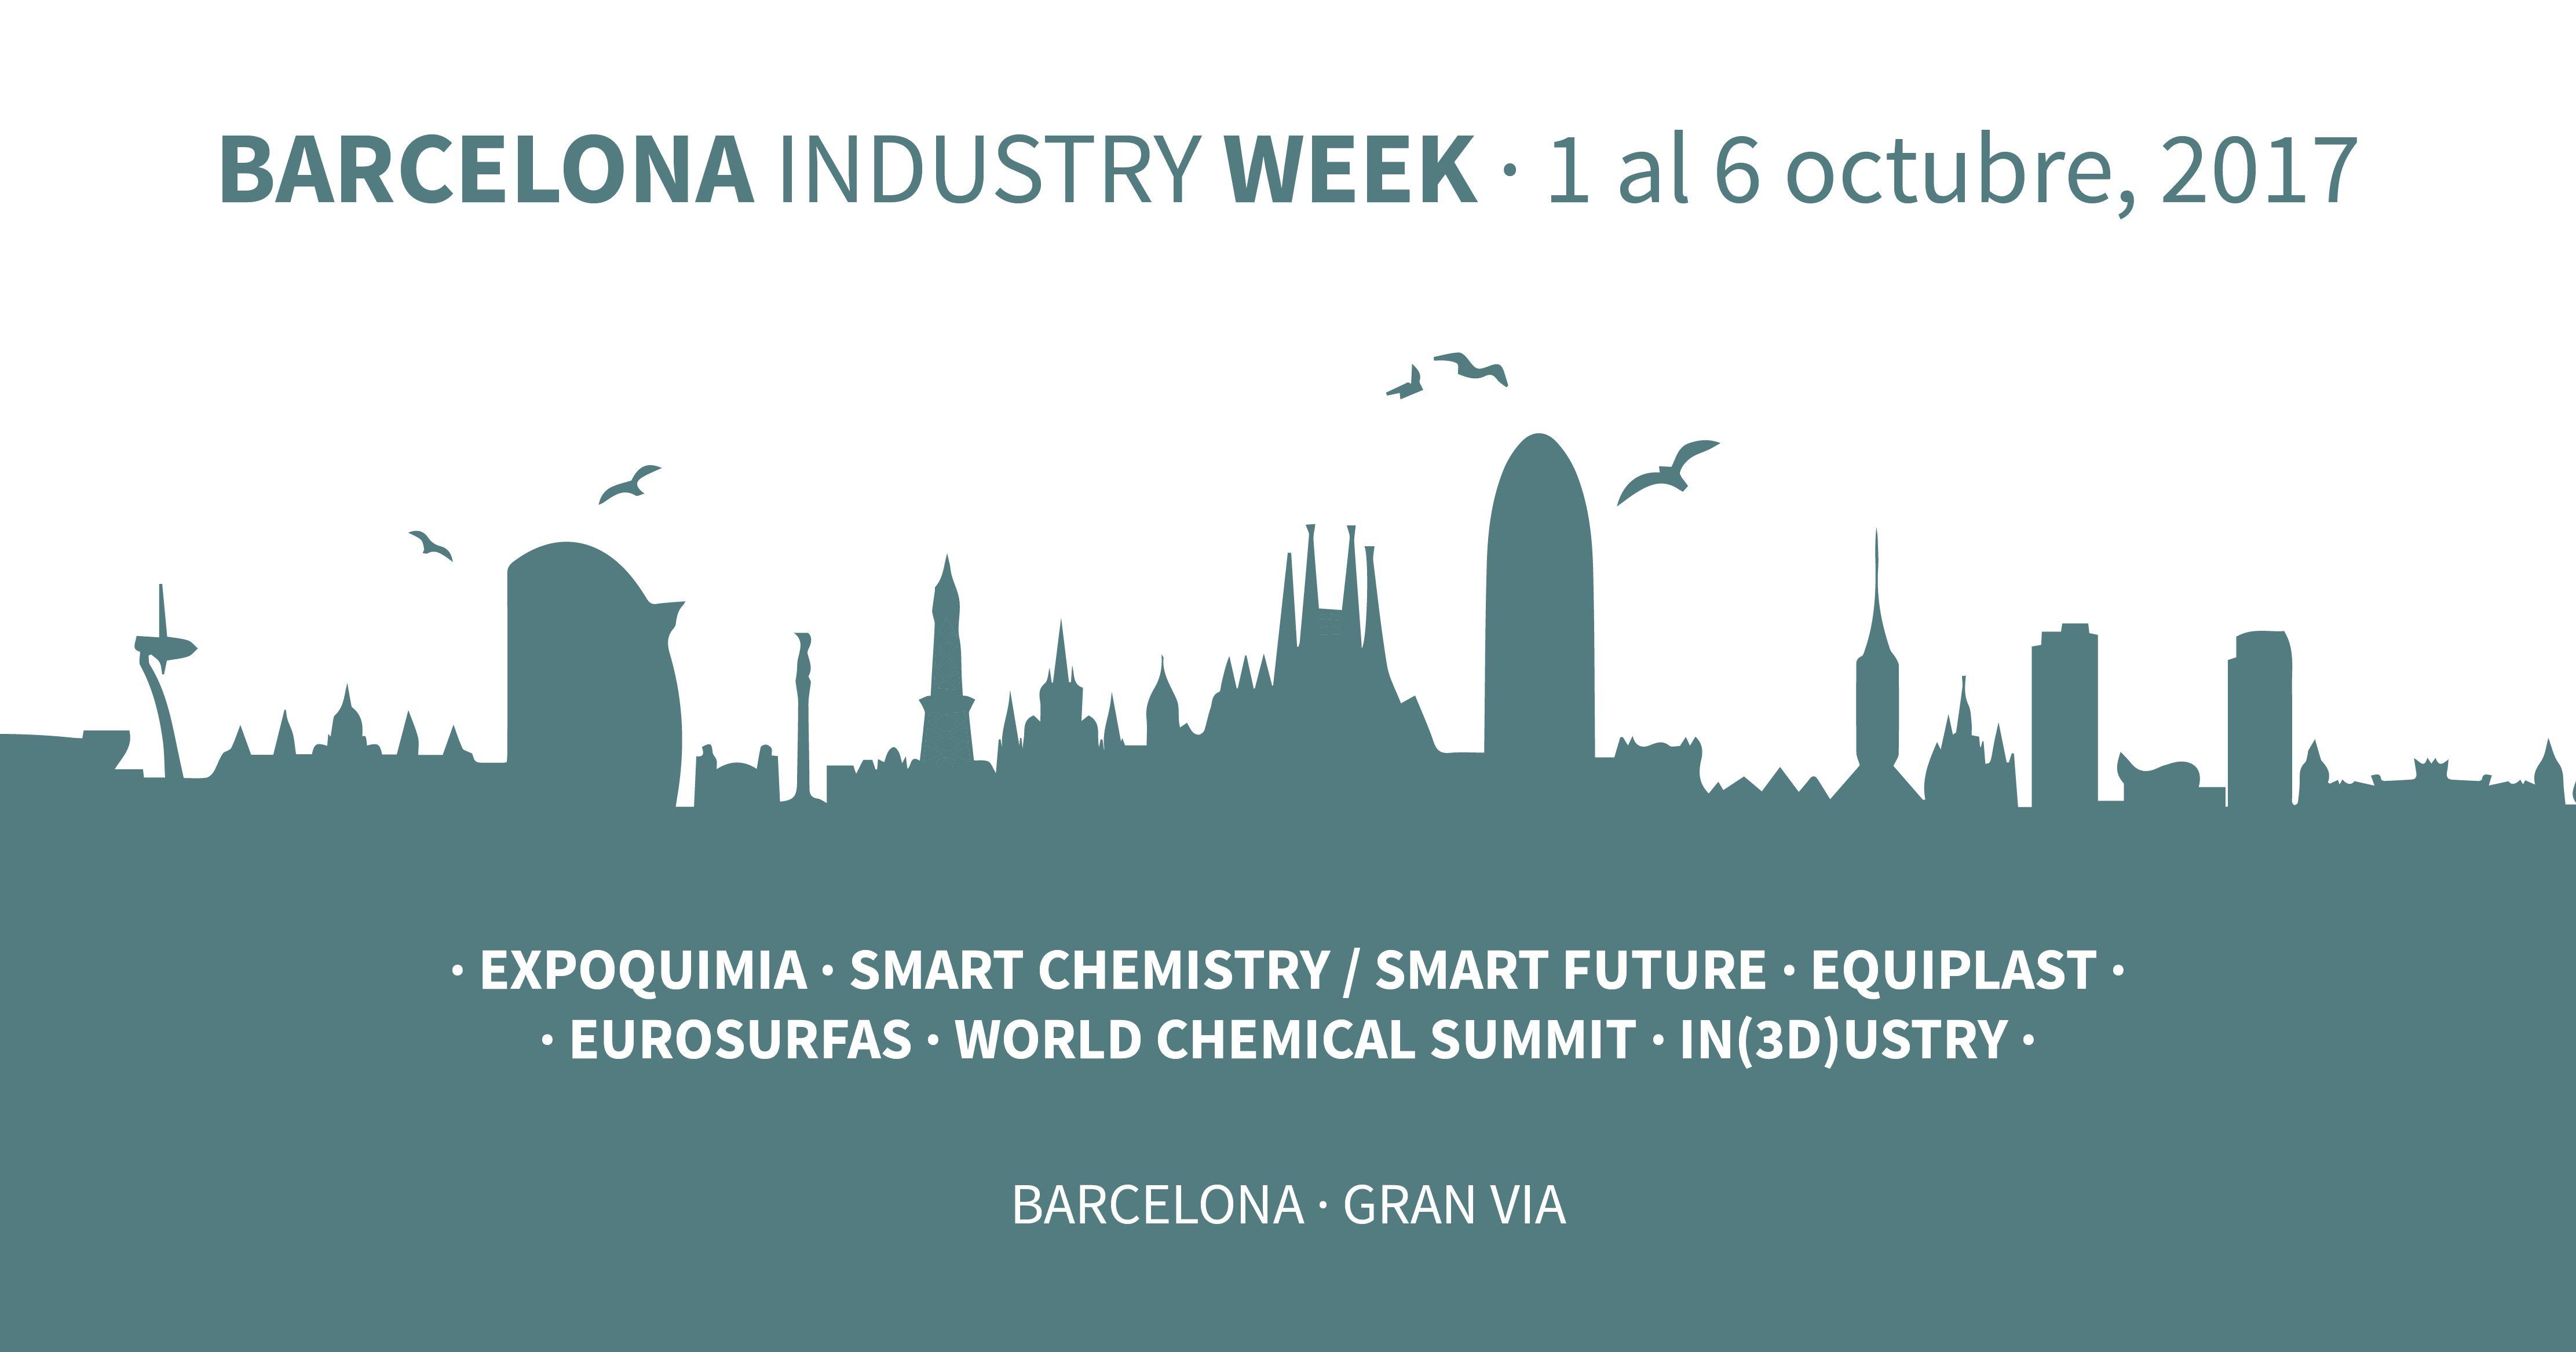 Barcelona Industry Week 2017